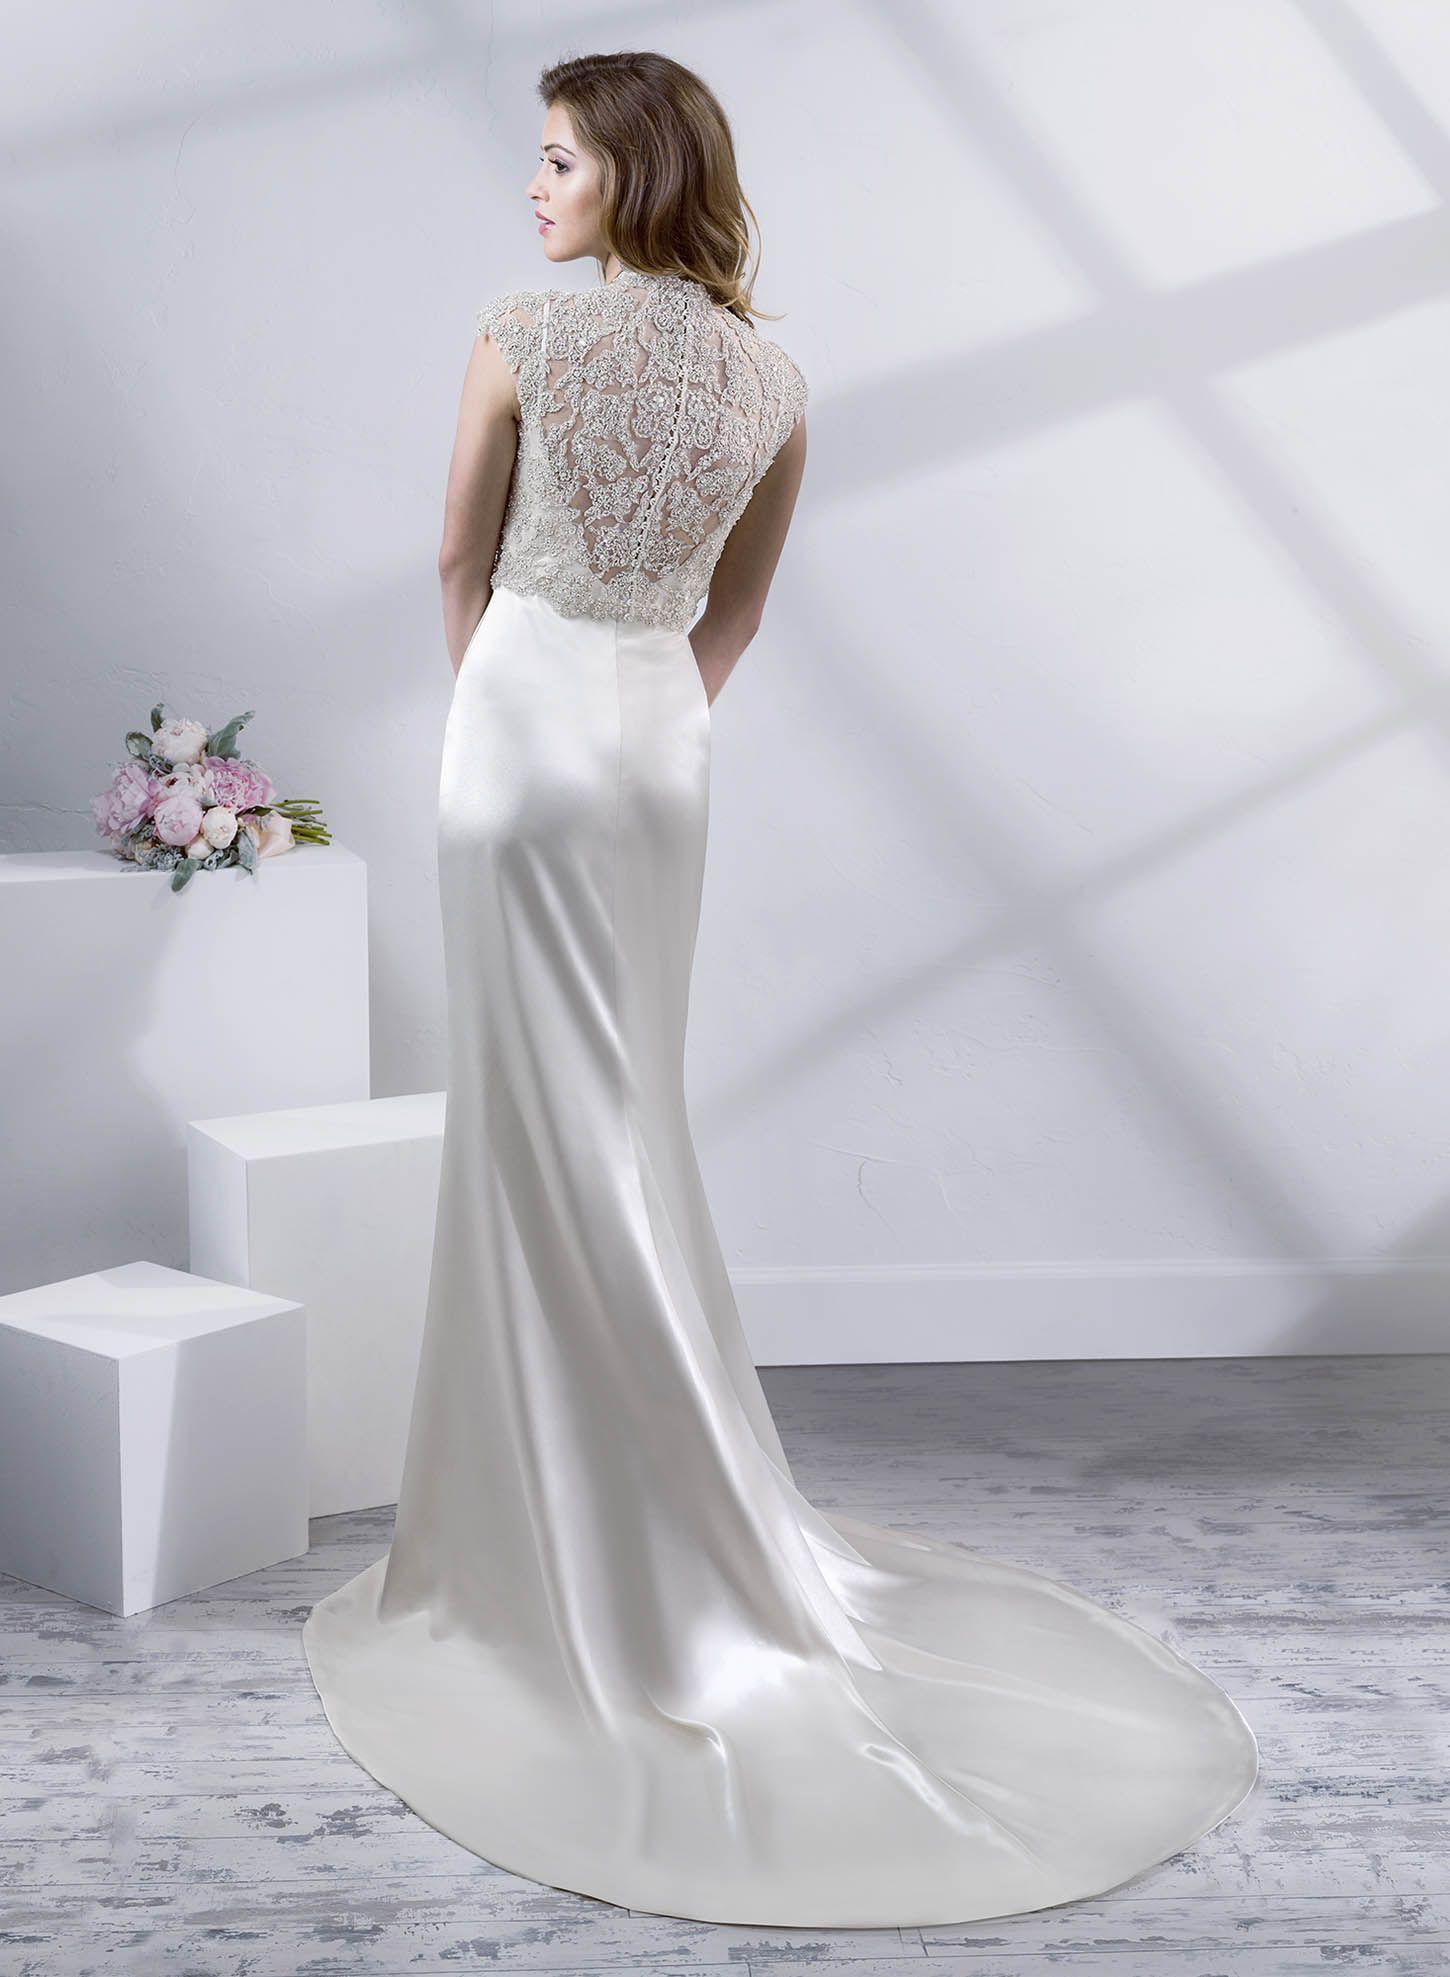 Bridal wedding dresses  Maggie Sottero Wedding Dresses  Maggie sottero Maggie sottero